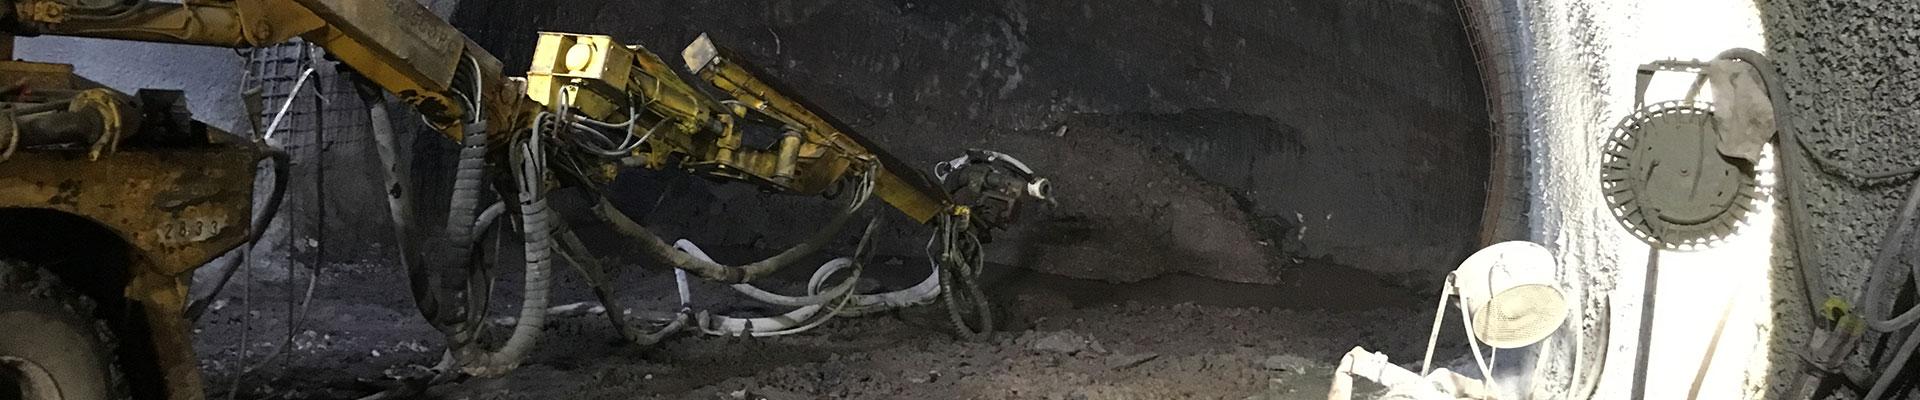 Hormigón proyectado túnel mina Súria Empresa de diseño geotécnico de túneles. Empresa de disseny geotècnic de túnels. Tunnel geotechnical design company.